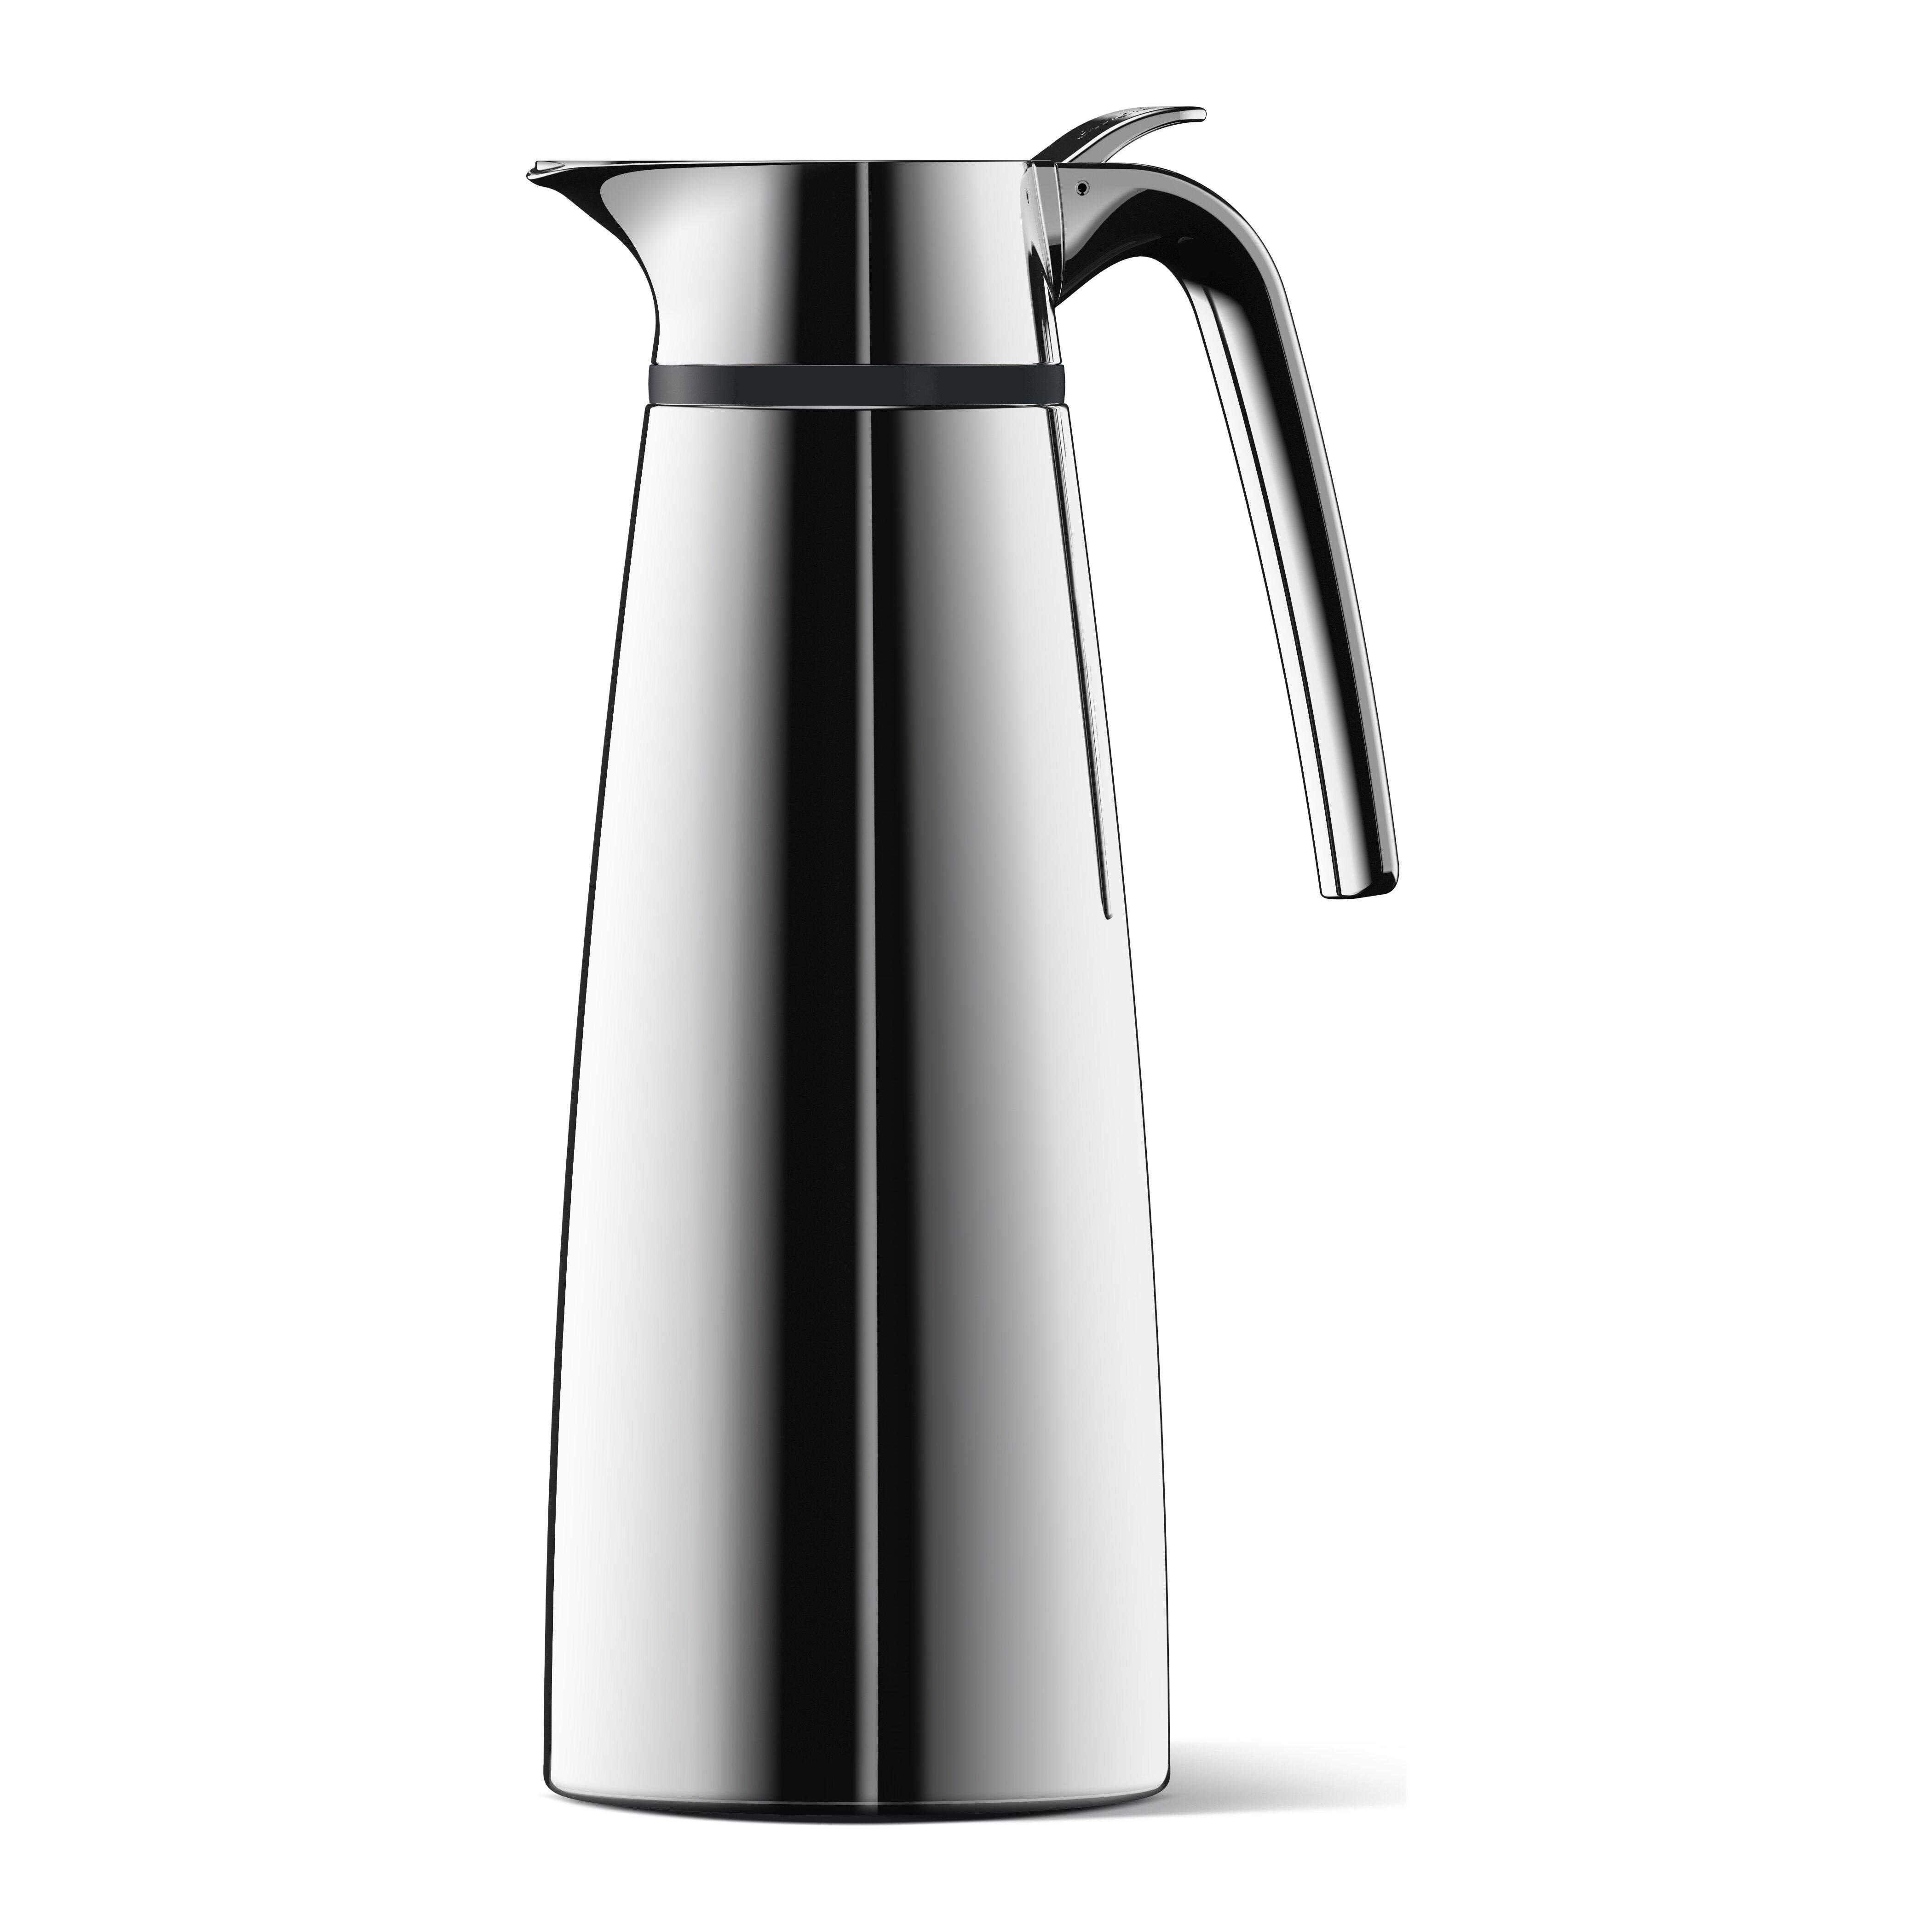 frieling cup coffee carafe wayfair. Black Bedroom Furniture Sets. Home Design Ideas